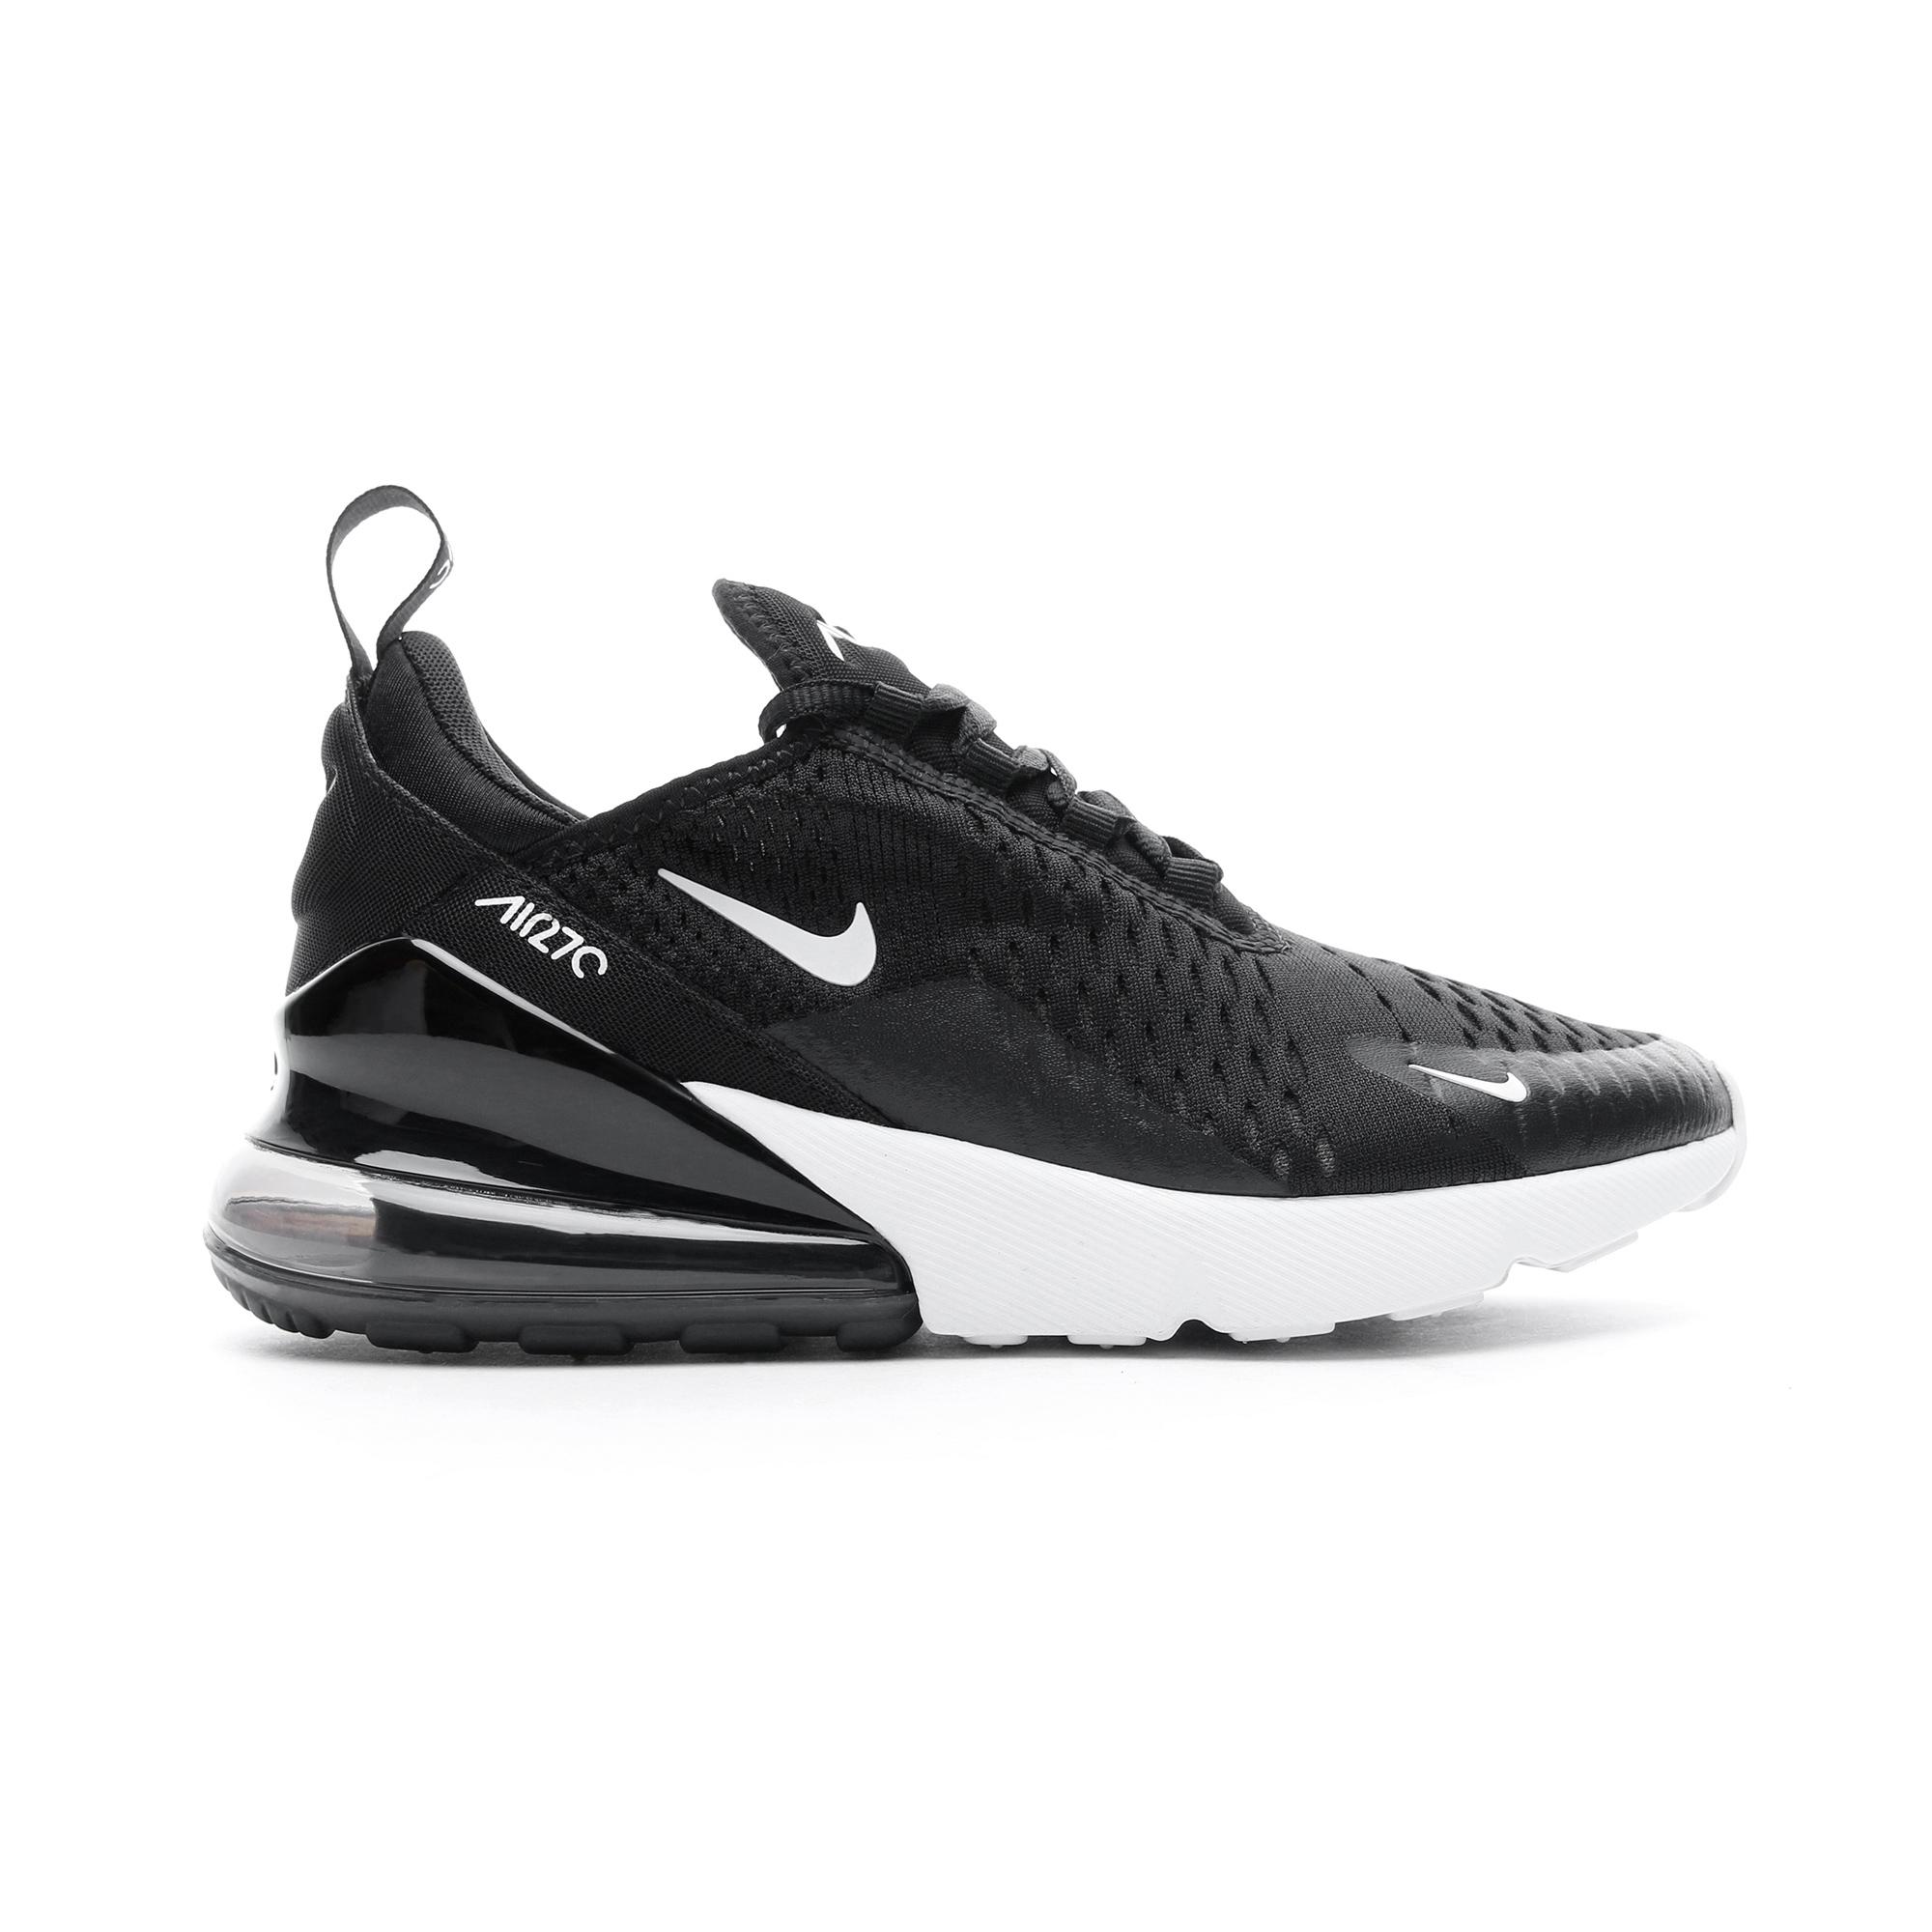 Nike Air Max 270 Unisex Siyah Spor Ayakkabı